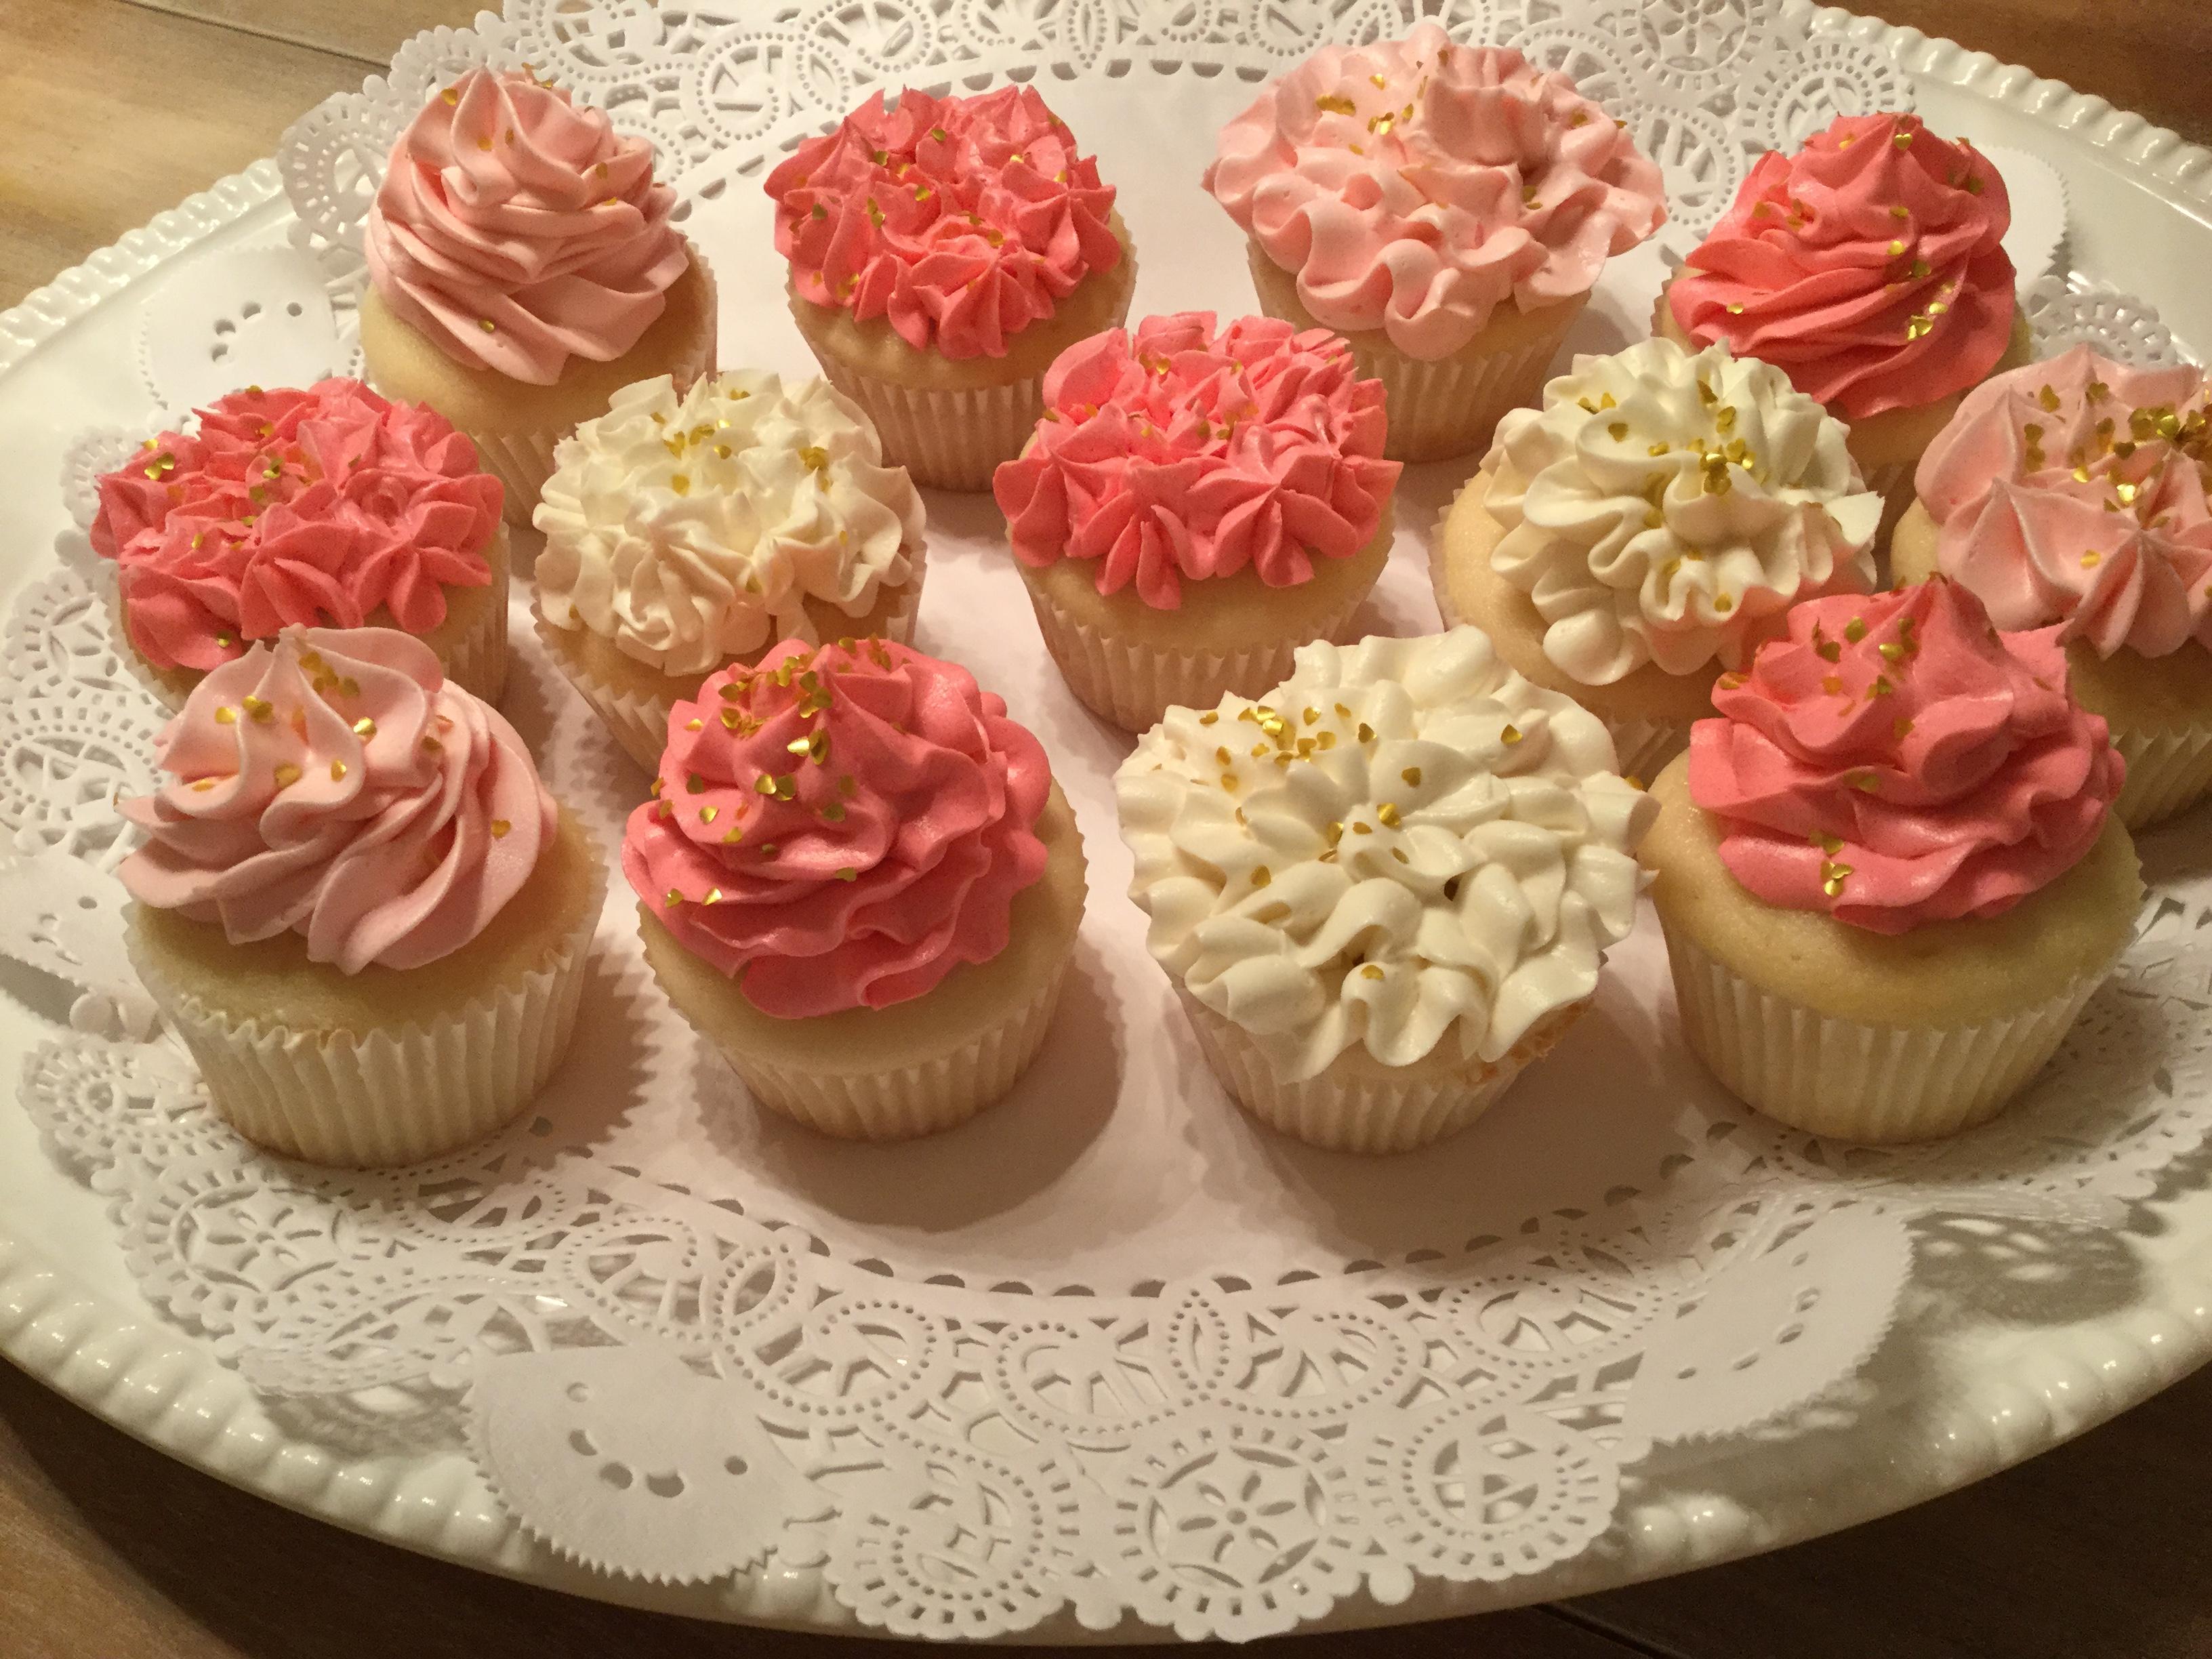 In Bloom cupcakes